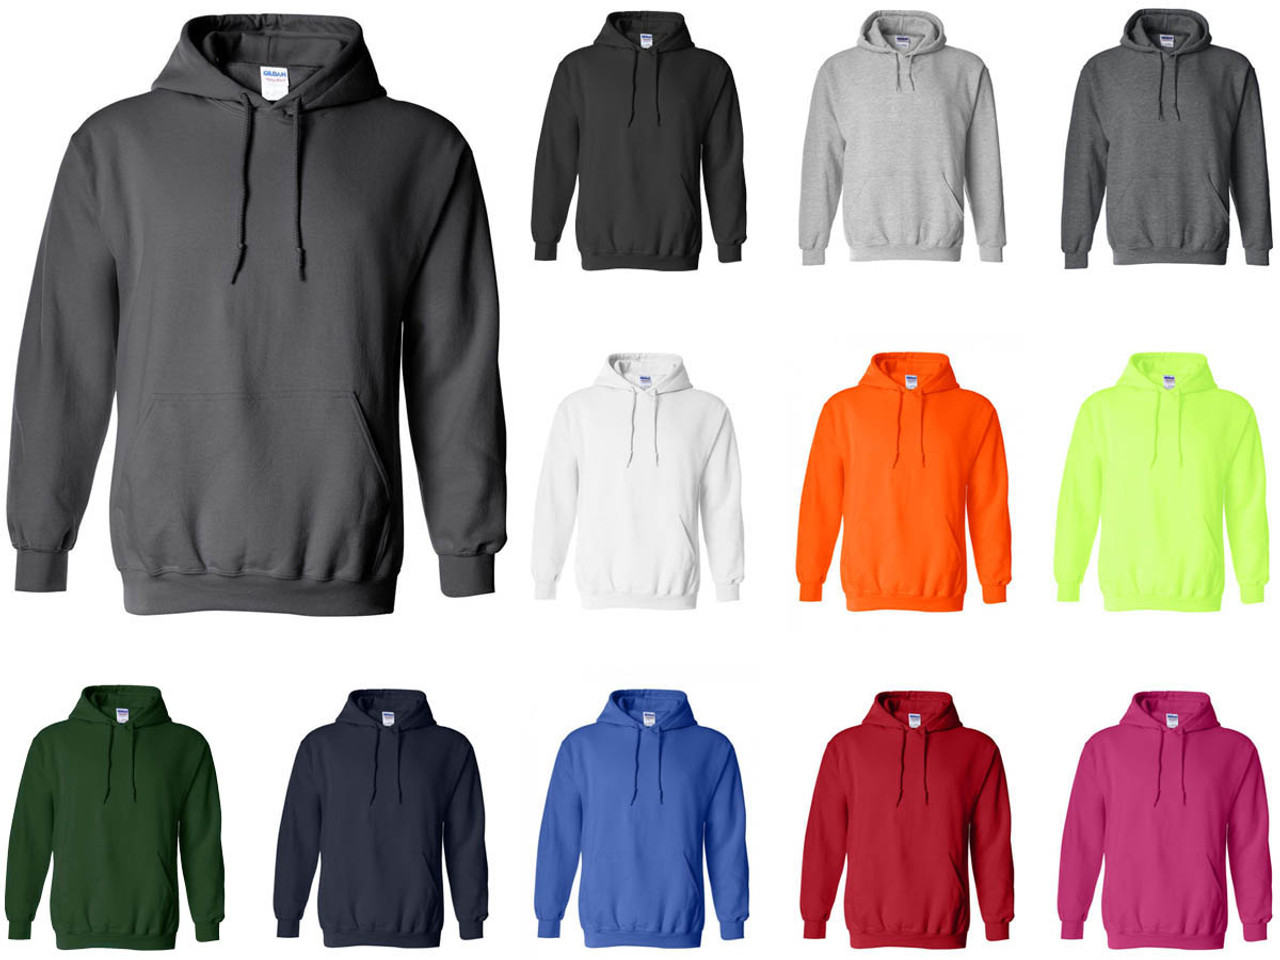 18500 Gildan® Heavy Blend™ Adult Hooded Sweatshirt Fleece Pullover Hoodie (12 Colors Available) 5080